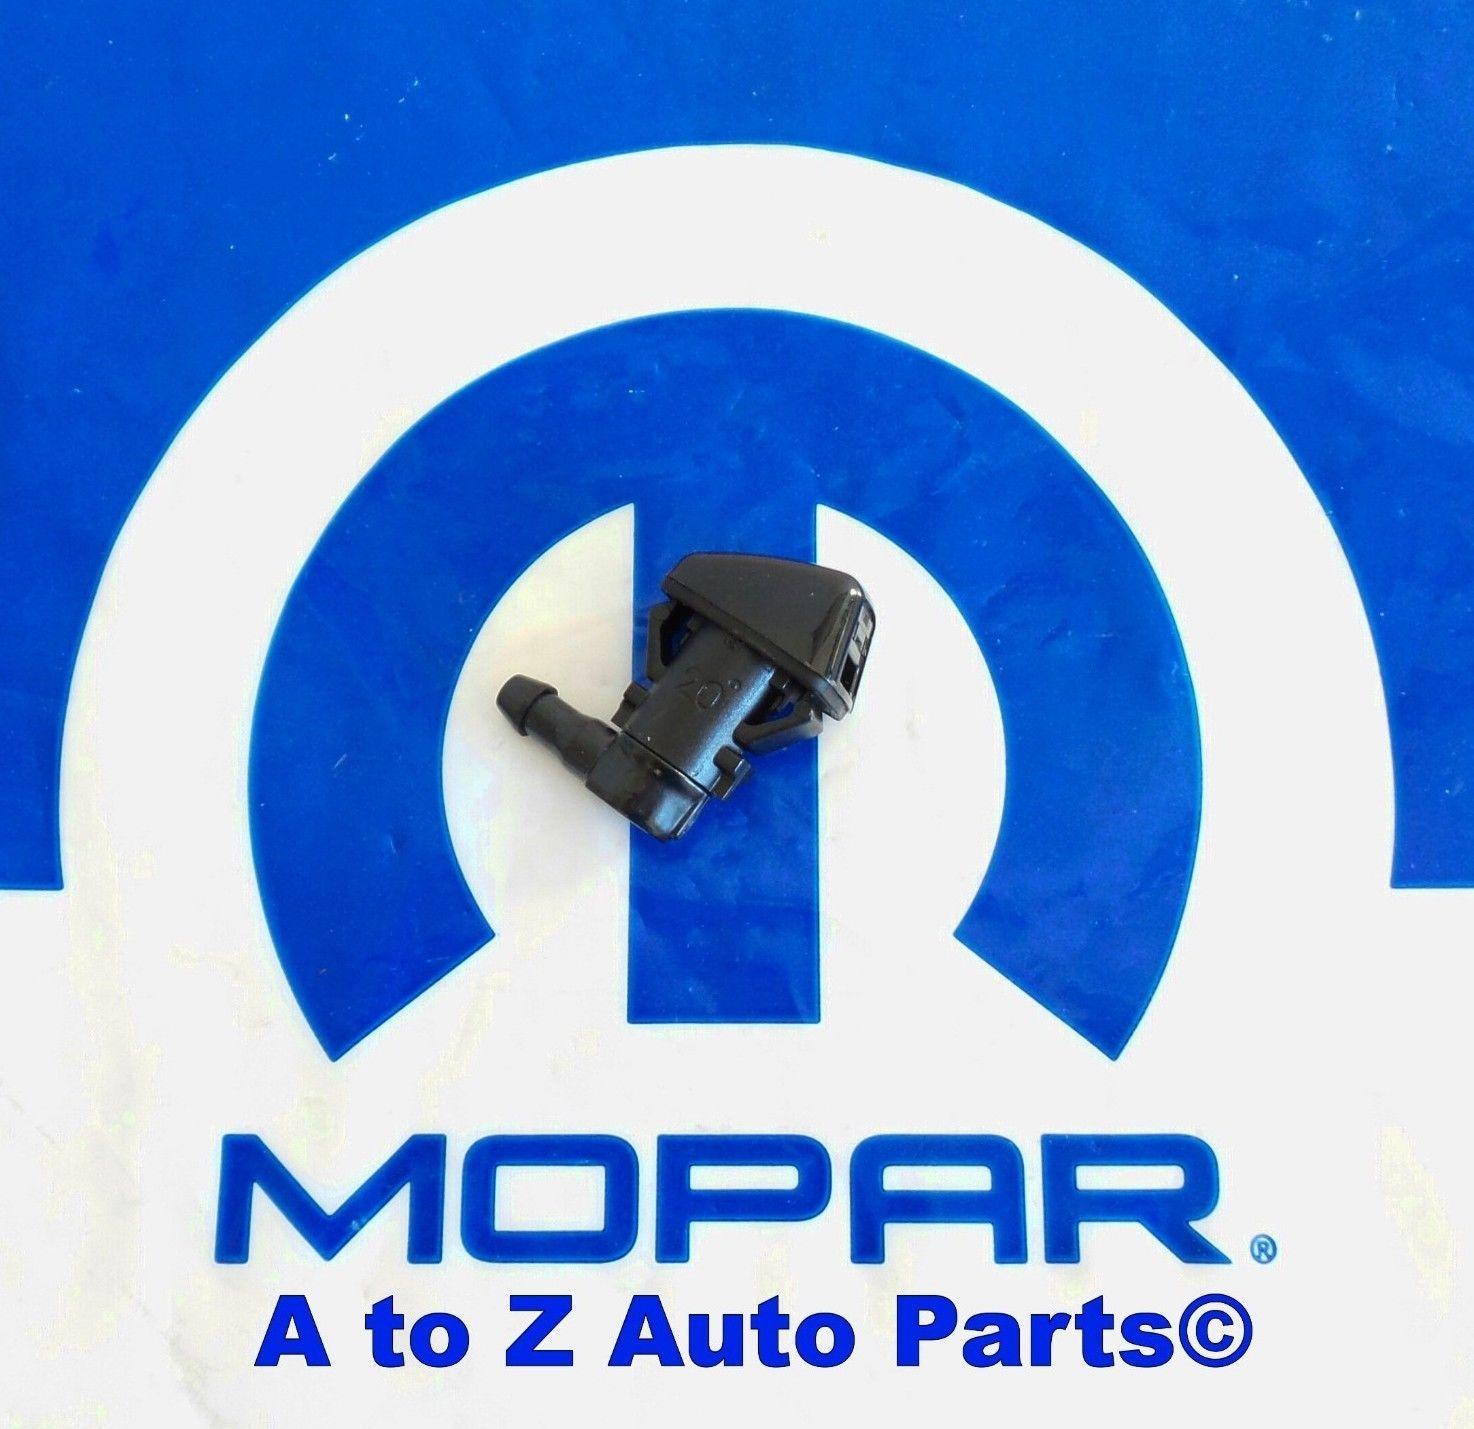 2008-2012 Jeep Liberty,Dodge Nitro Windshield Washer Squirter / Nozzle,OEM Mopar